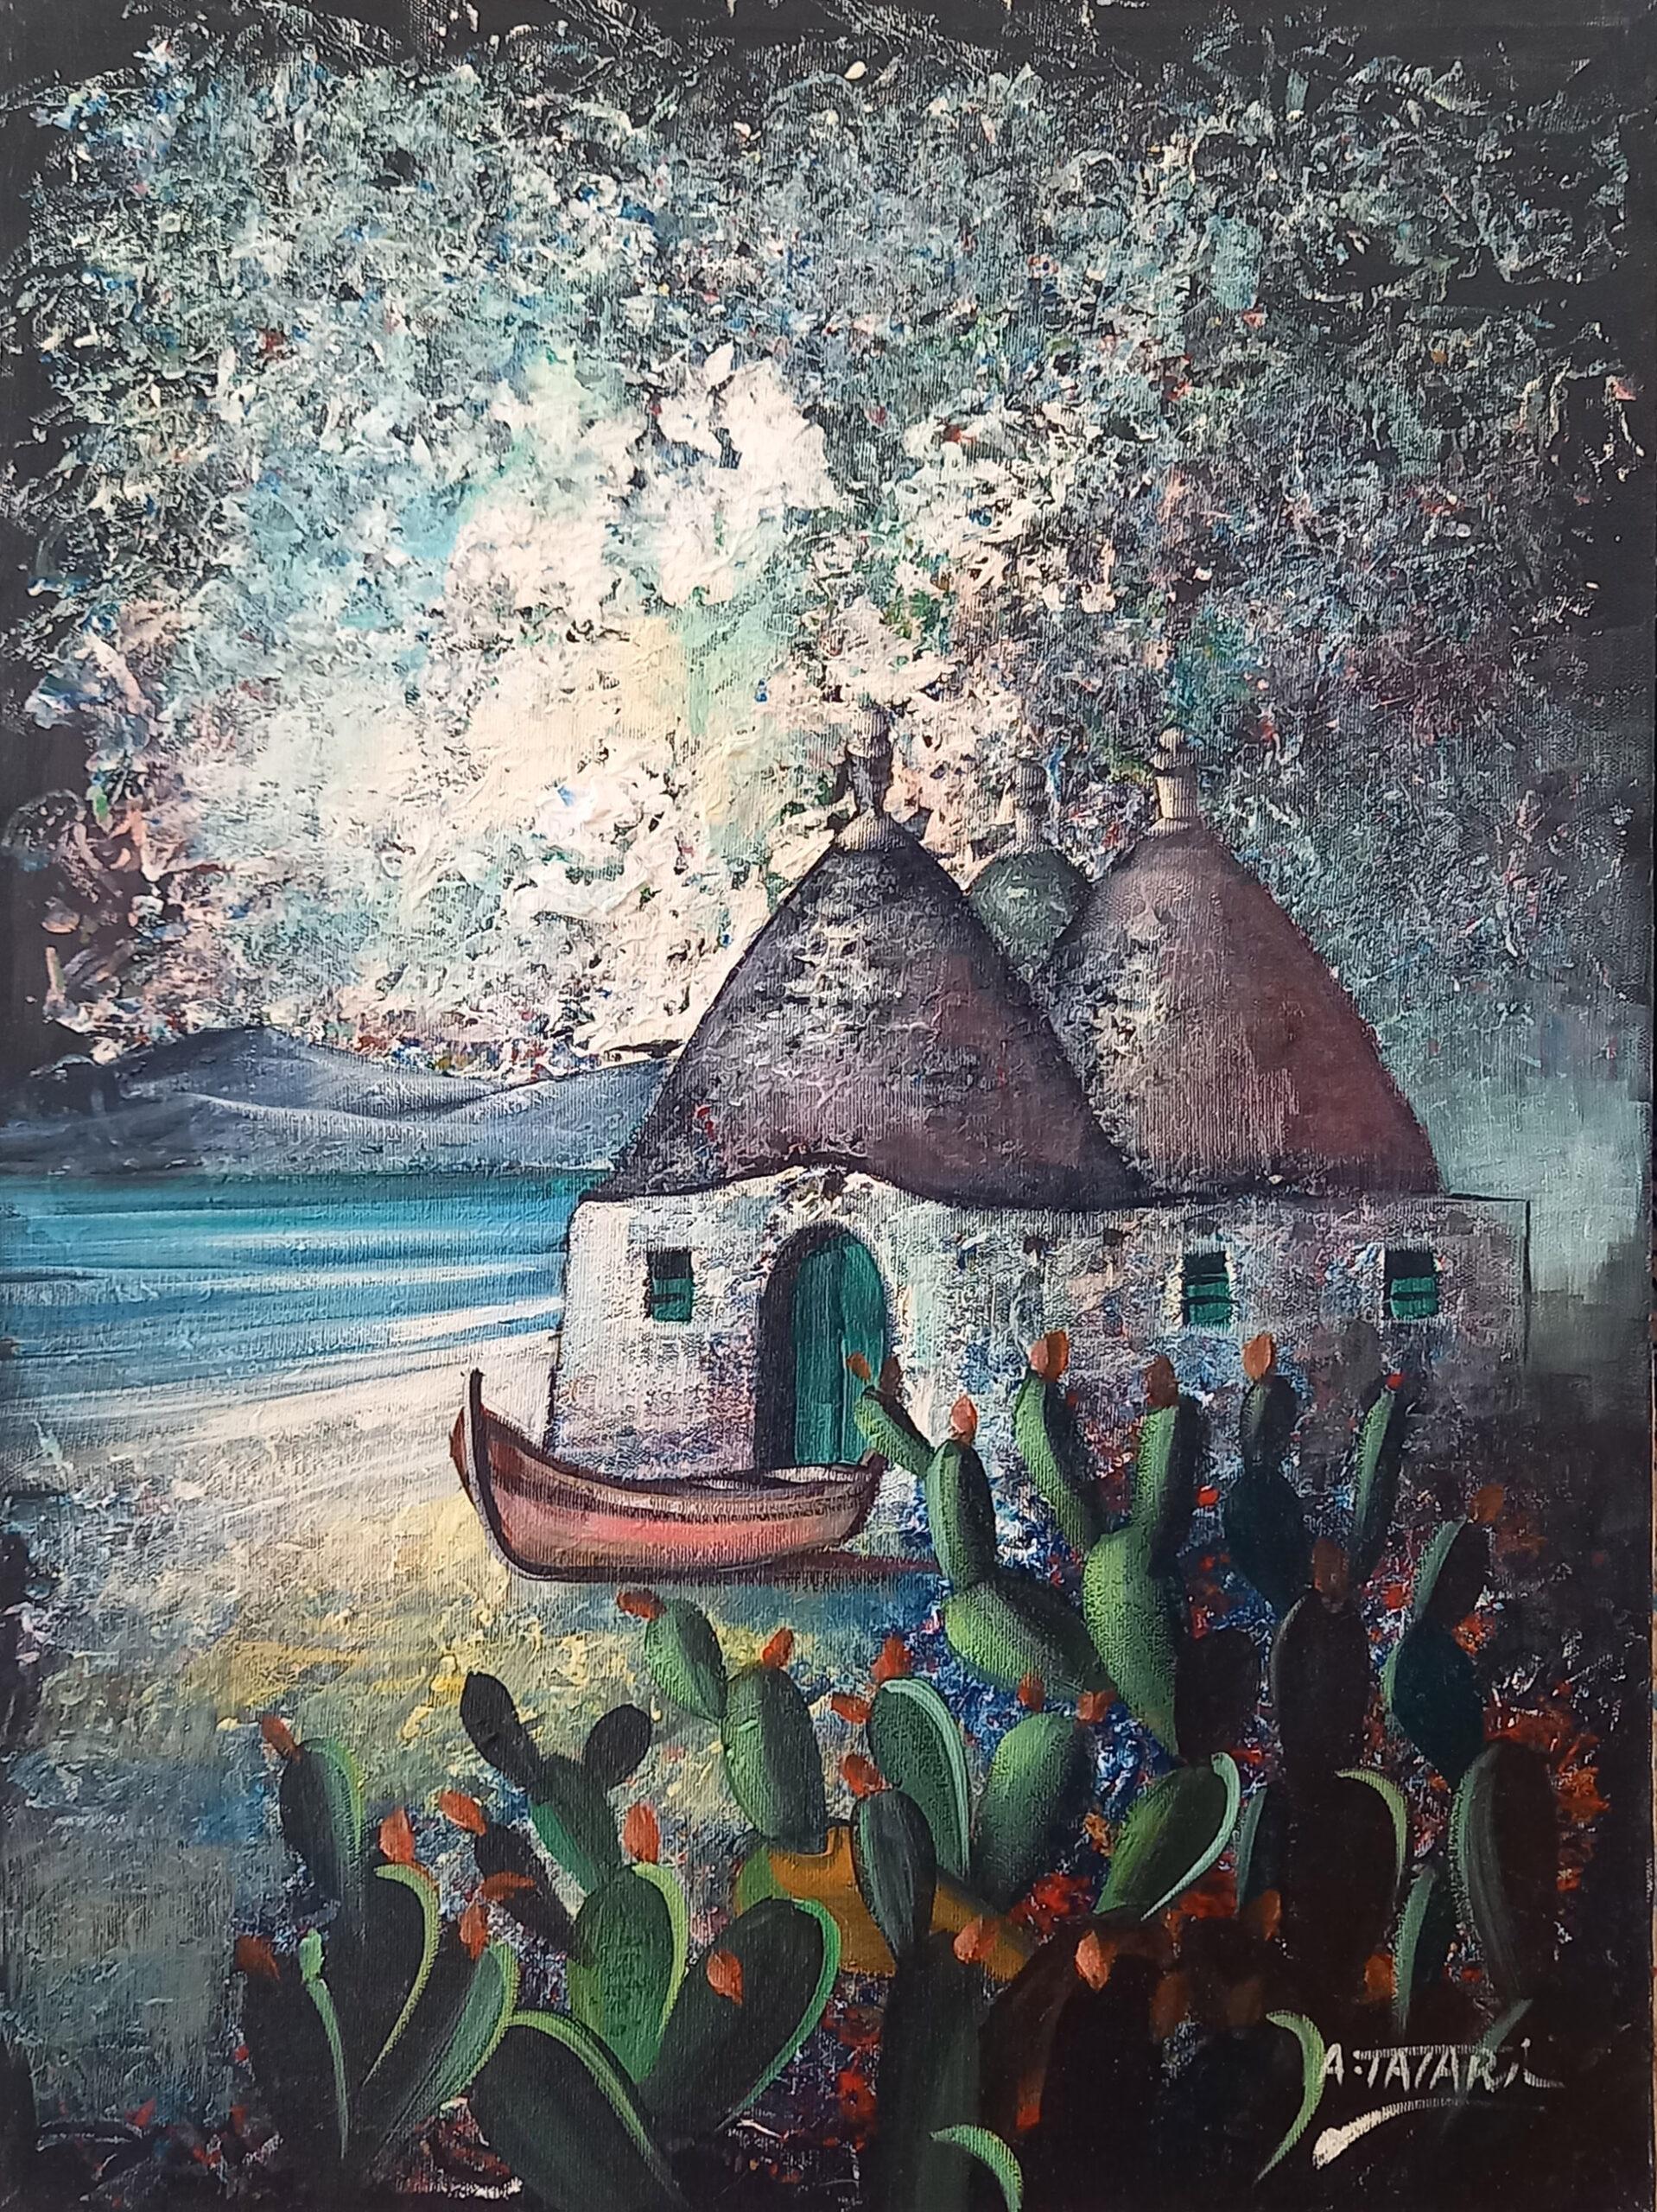 Abdul Rahem Tatari – Alberobello